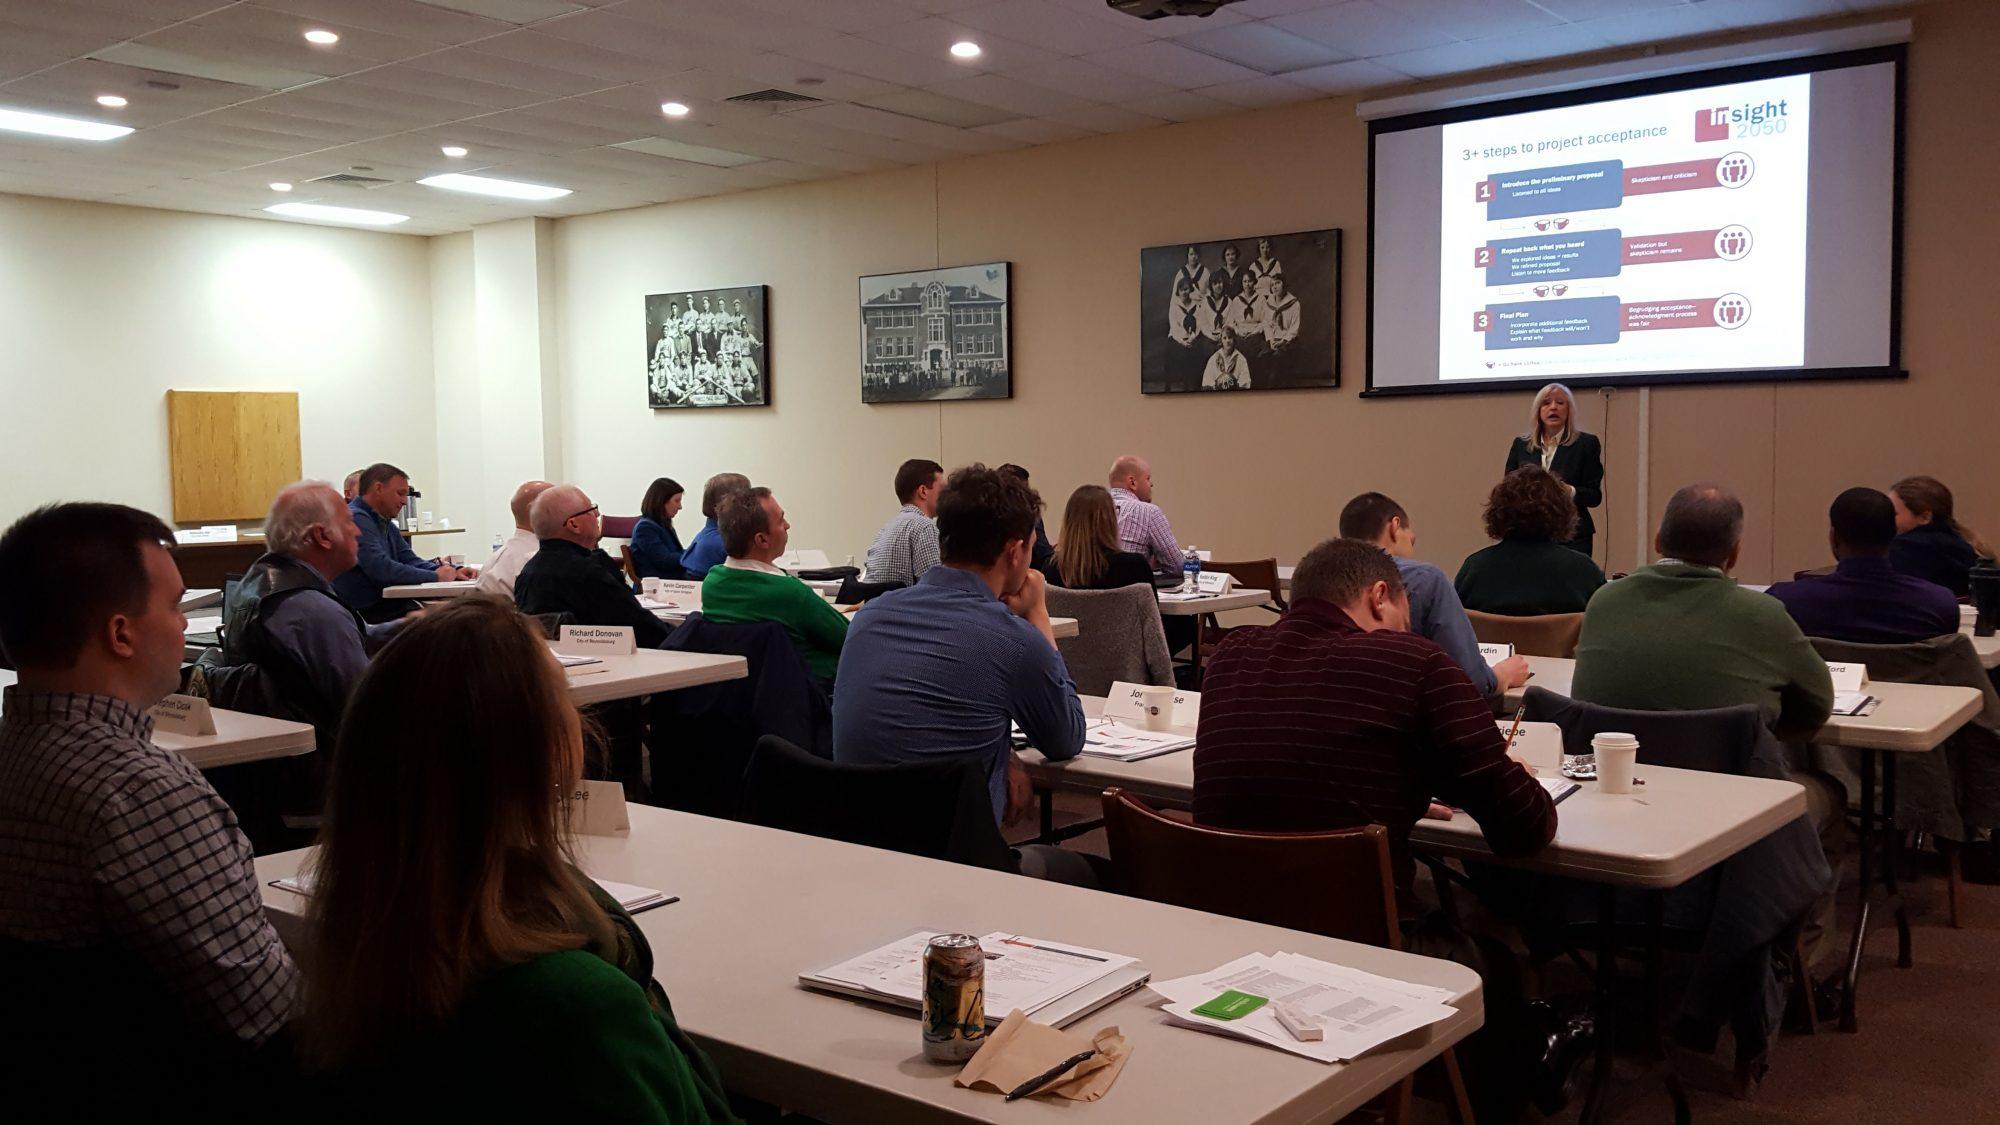 insight 2050 presentation meeting